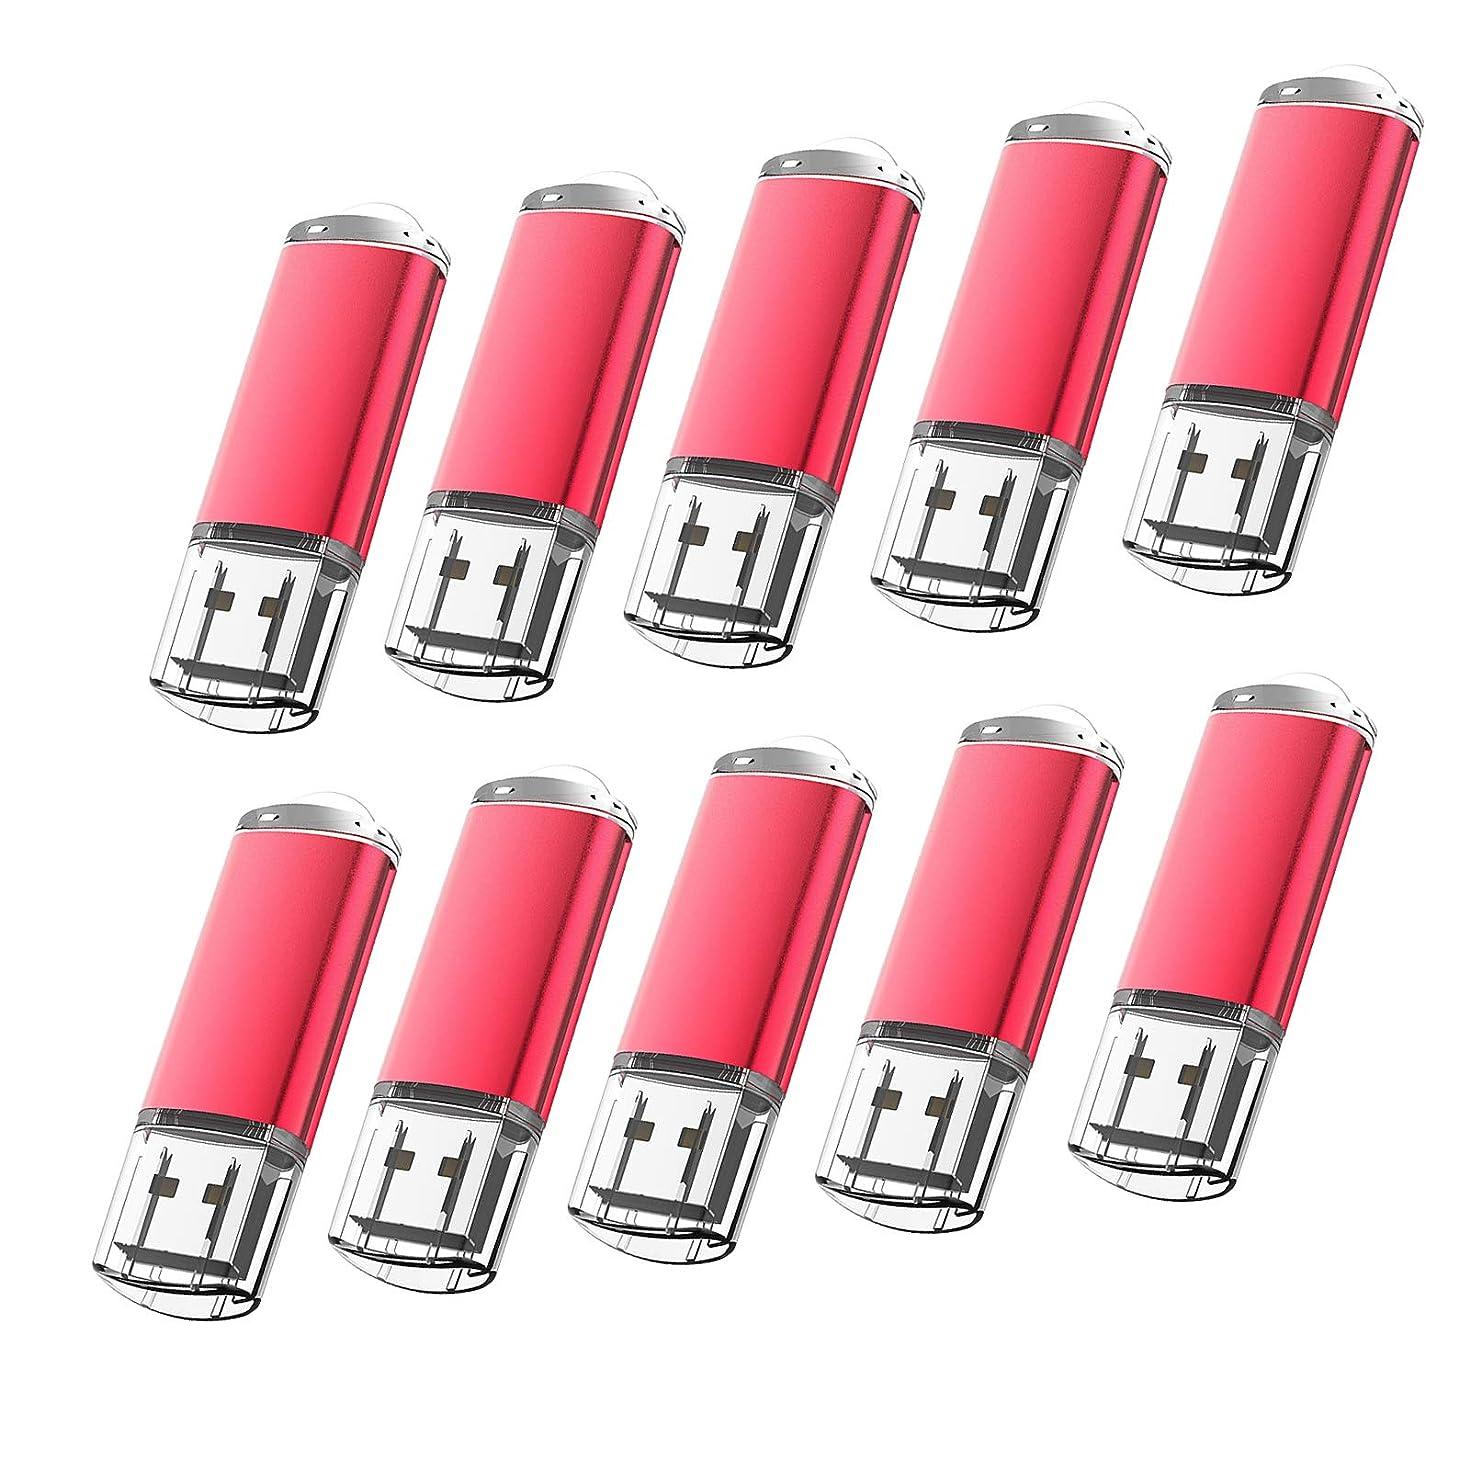 KOOTION 10 X 32GB USB Flash Drives Pack 2.0 USB Memory Stick Storage Thumb Disk (32GB, Red)